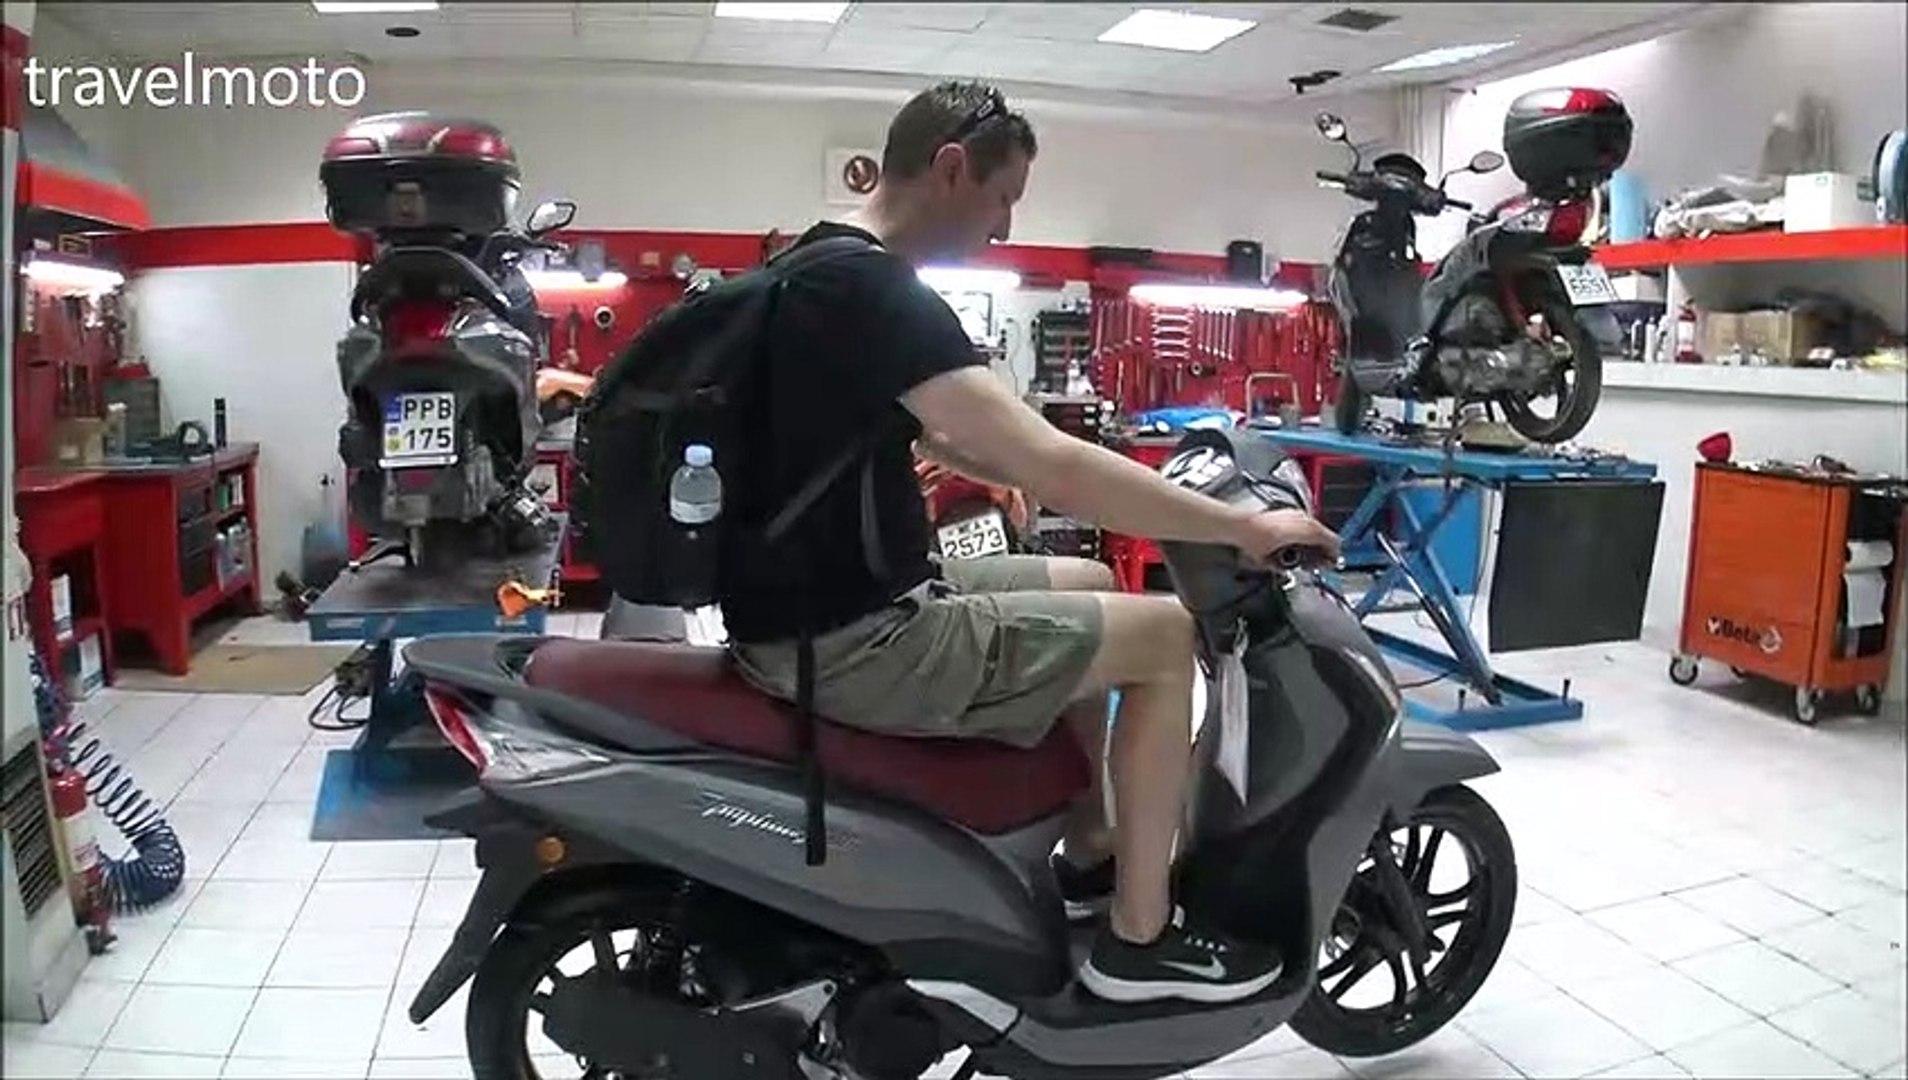 SYM Symphony ST 125cc scooter review 2019